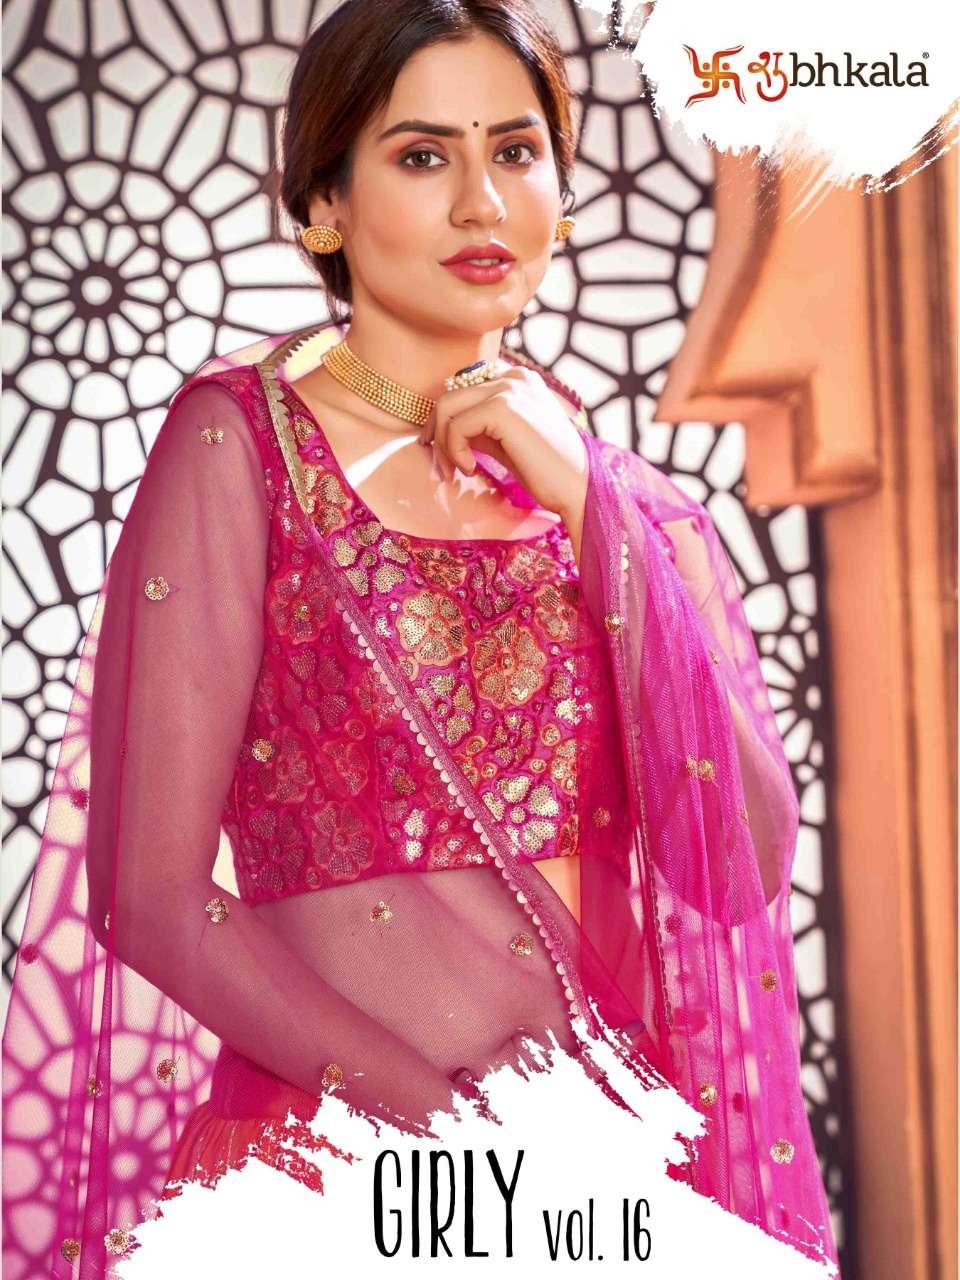 Shubhkala Girly Vol. 16 Girly Look Designer Lehenga Choli Collection